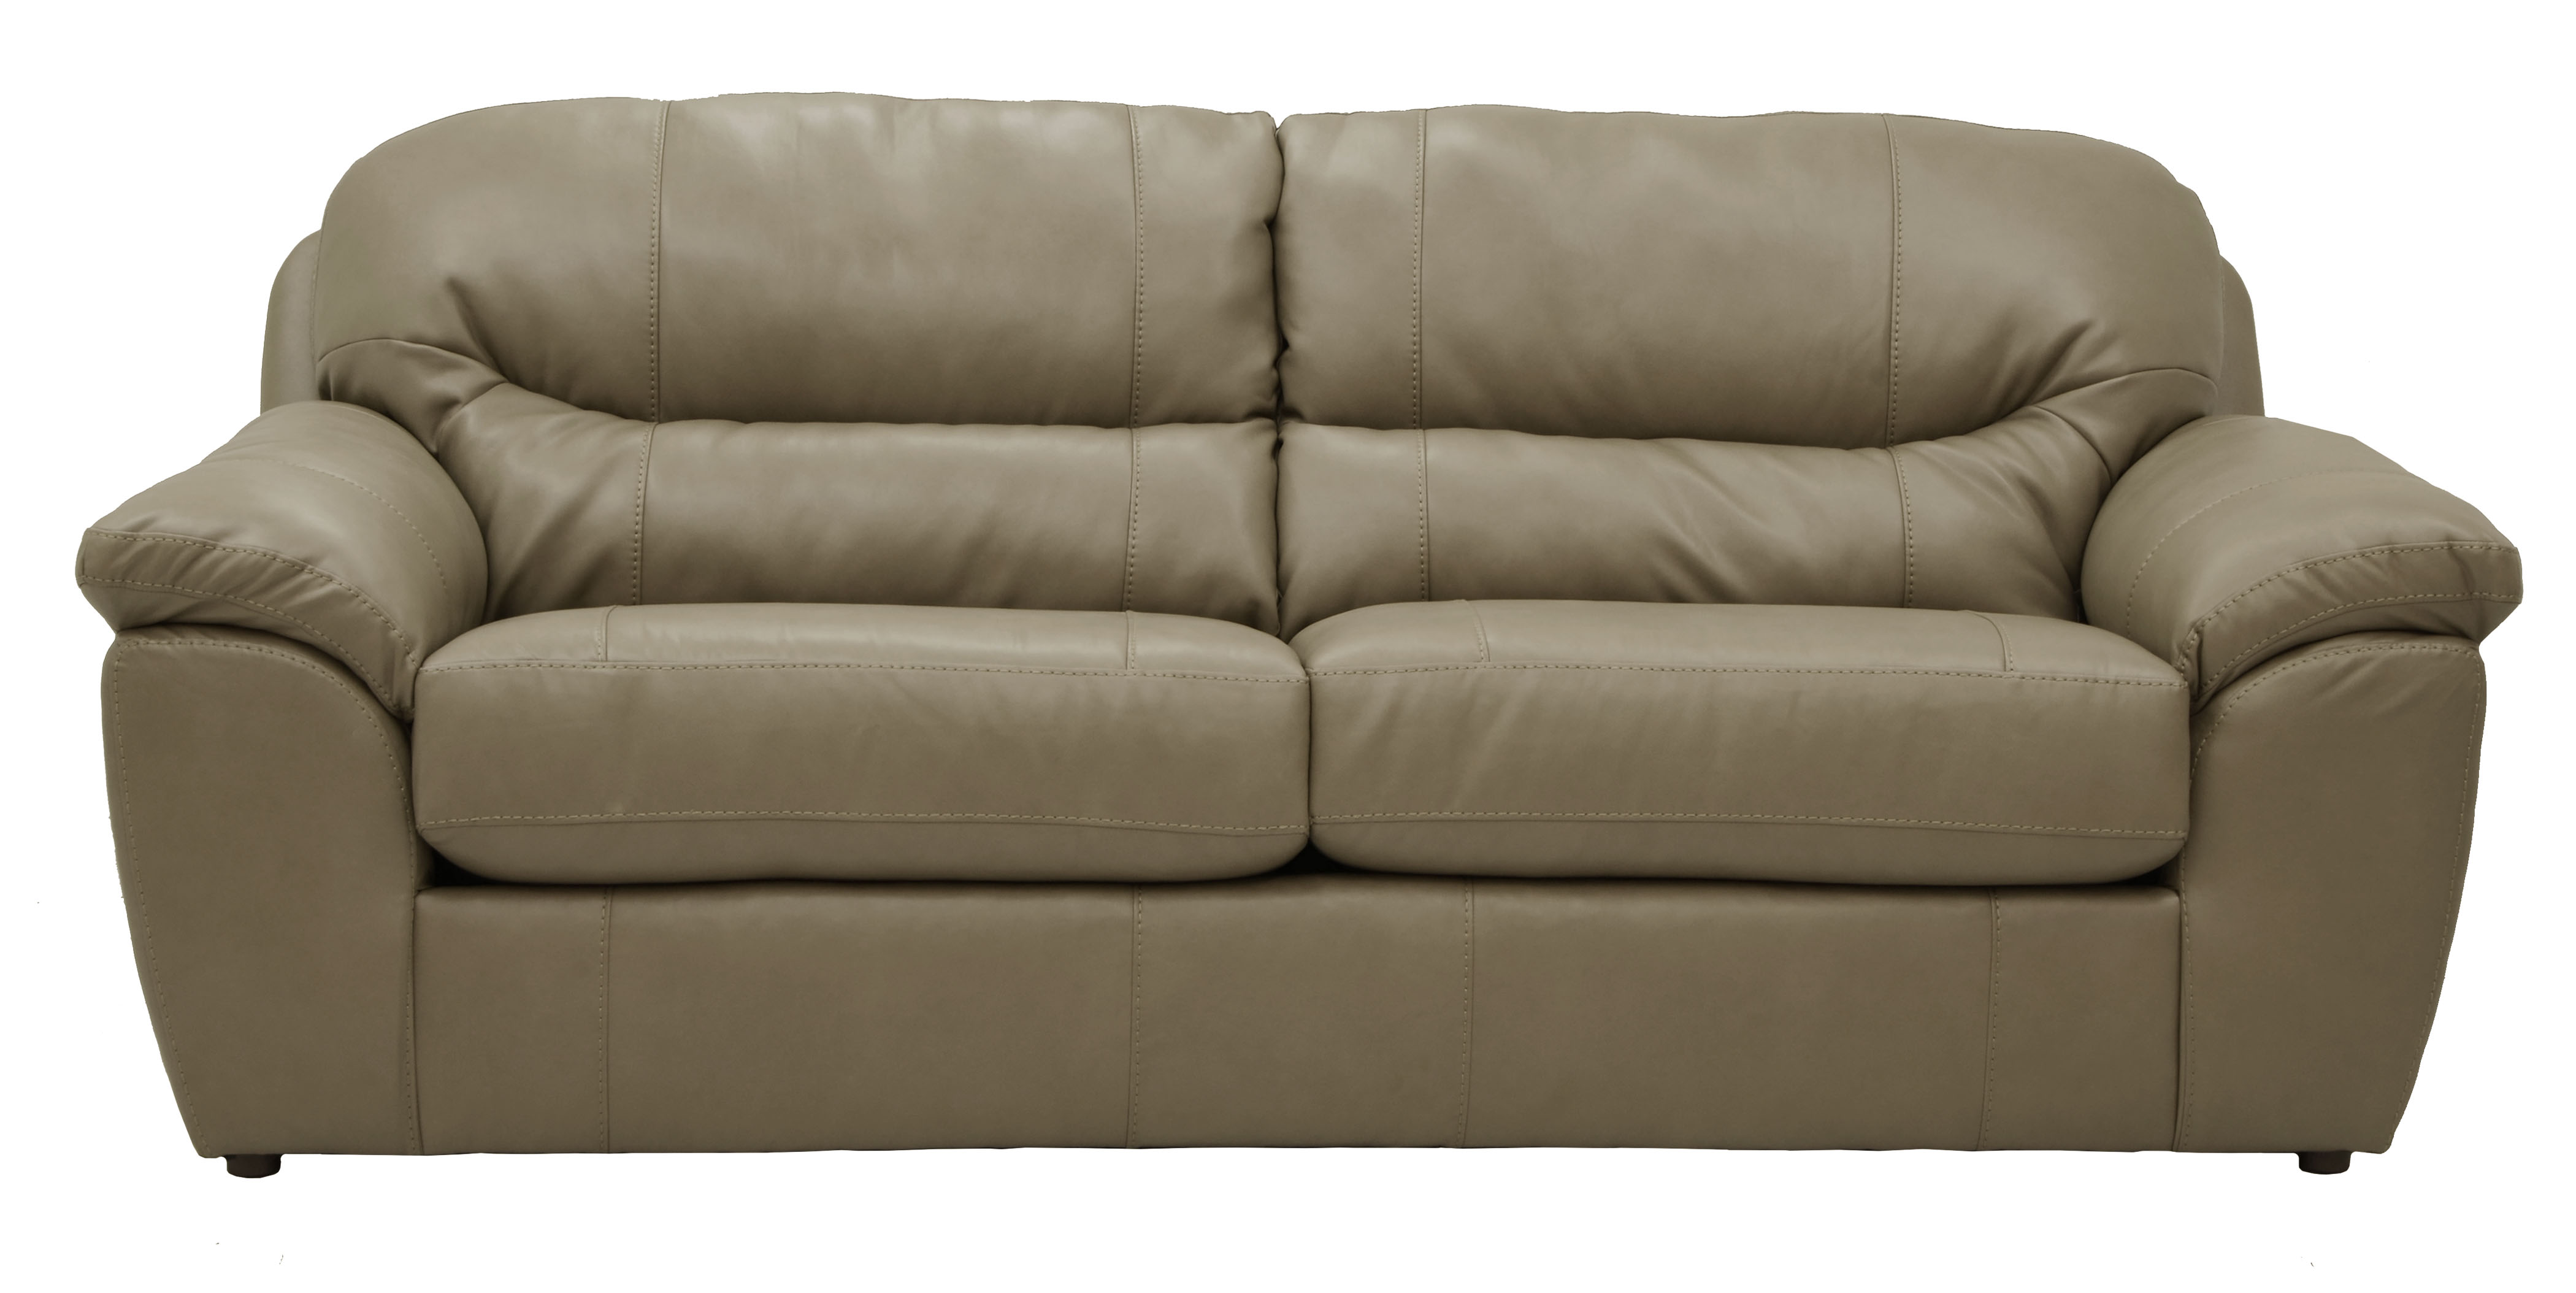 Jackson 174 Brantley Putty 443003 Sofa Or 443002 Love Seat